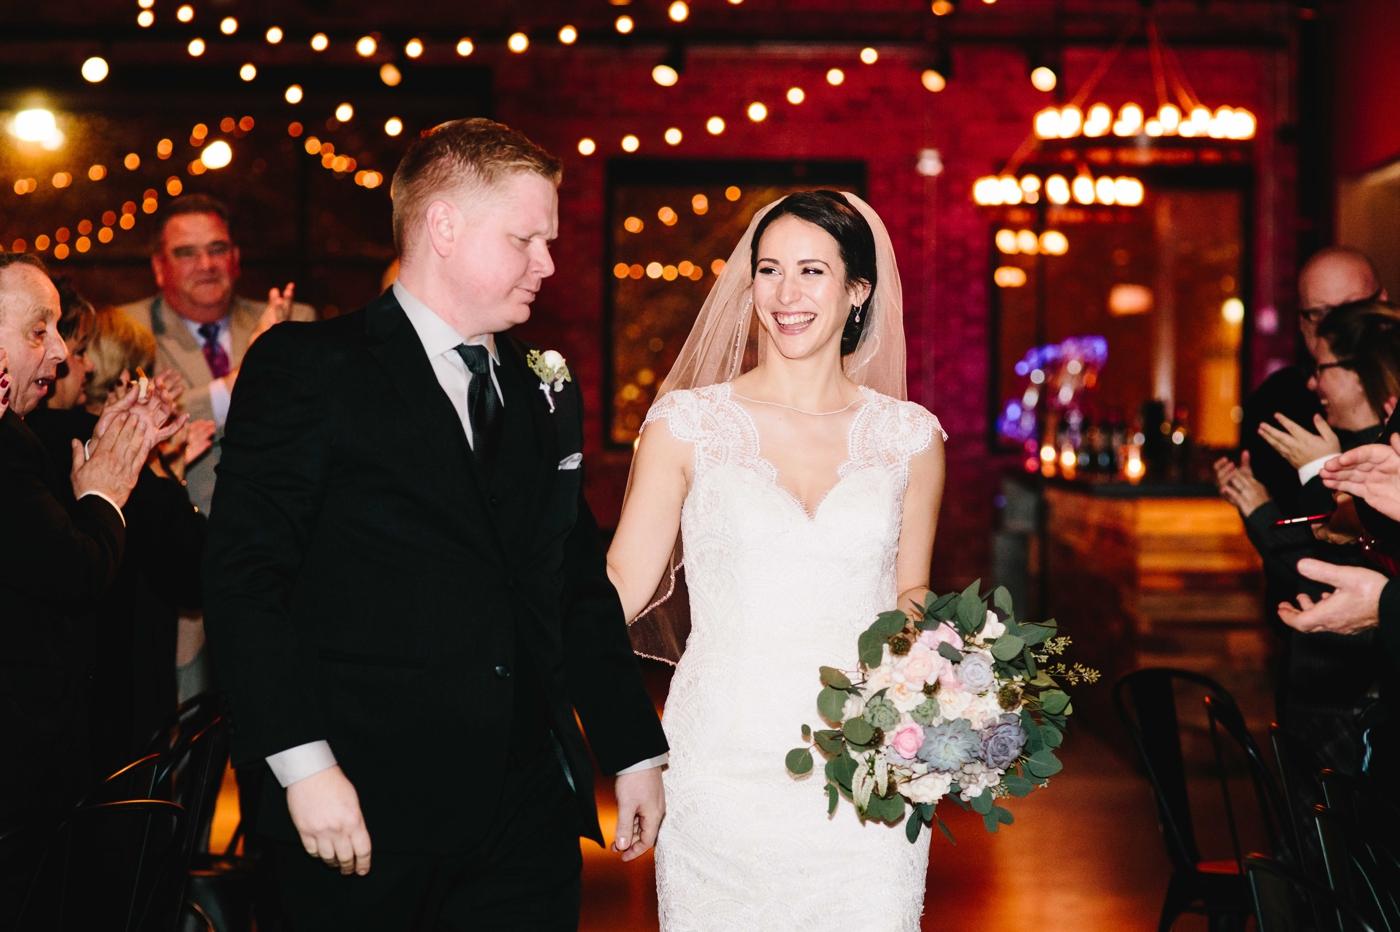 chicago-fine-art-wedding-photography-lintelman38